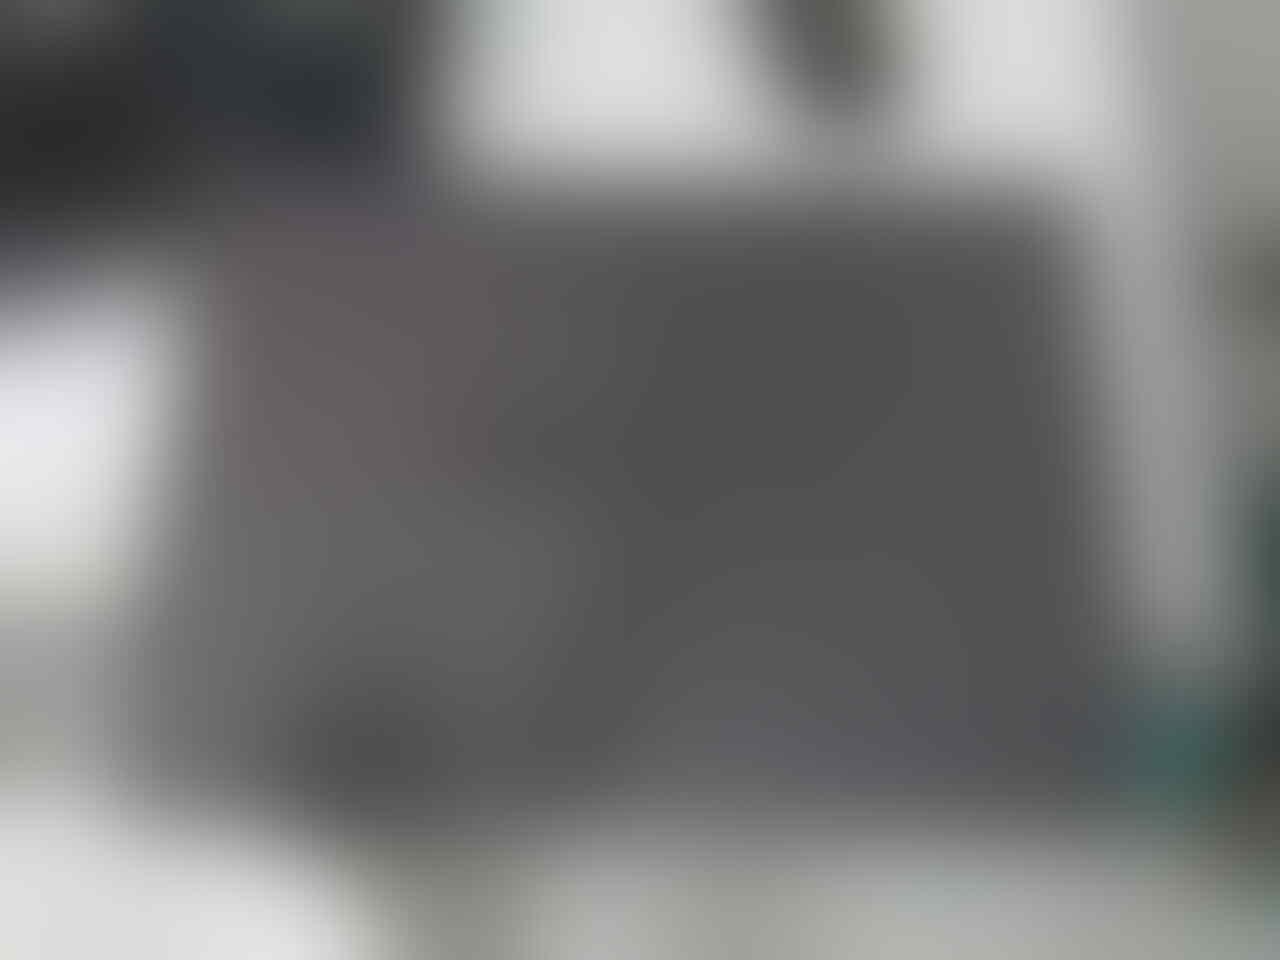 [VGA][UNBOXING] ZOTAC GTX 1070 Founder Edition